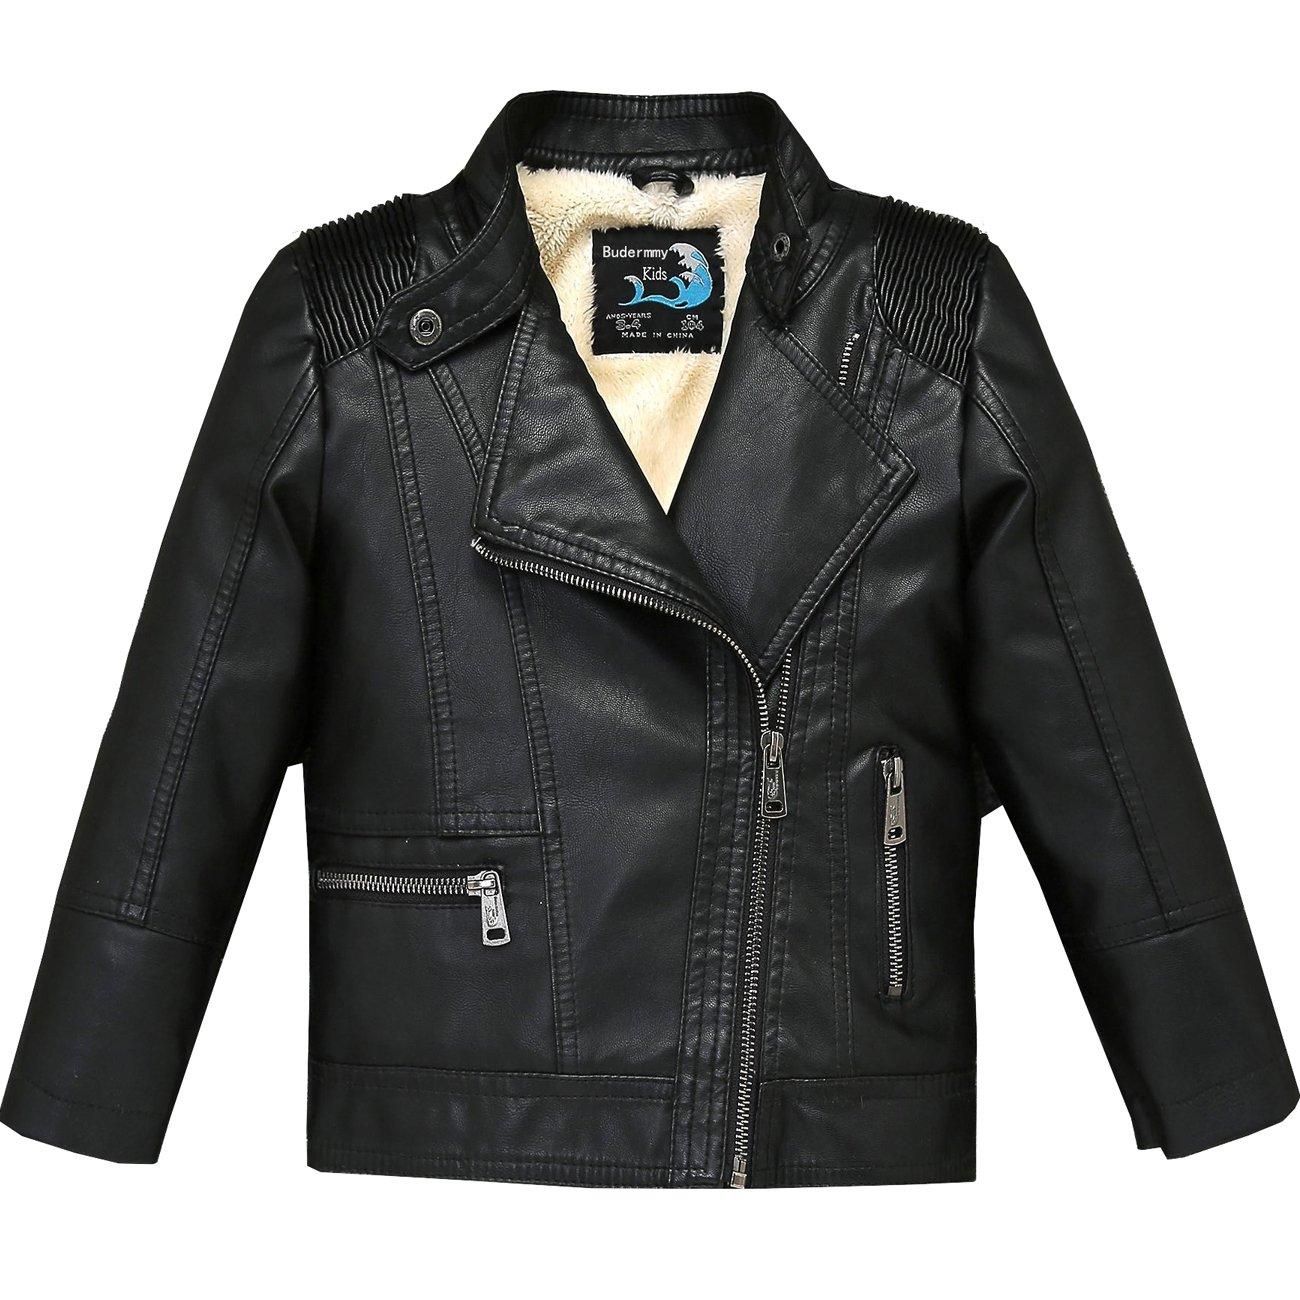 Budermmy Boys Faux Leather Motorcycle Moto Biker Jackets Zipper Coats Black 1 Size 3T by Budermmy